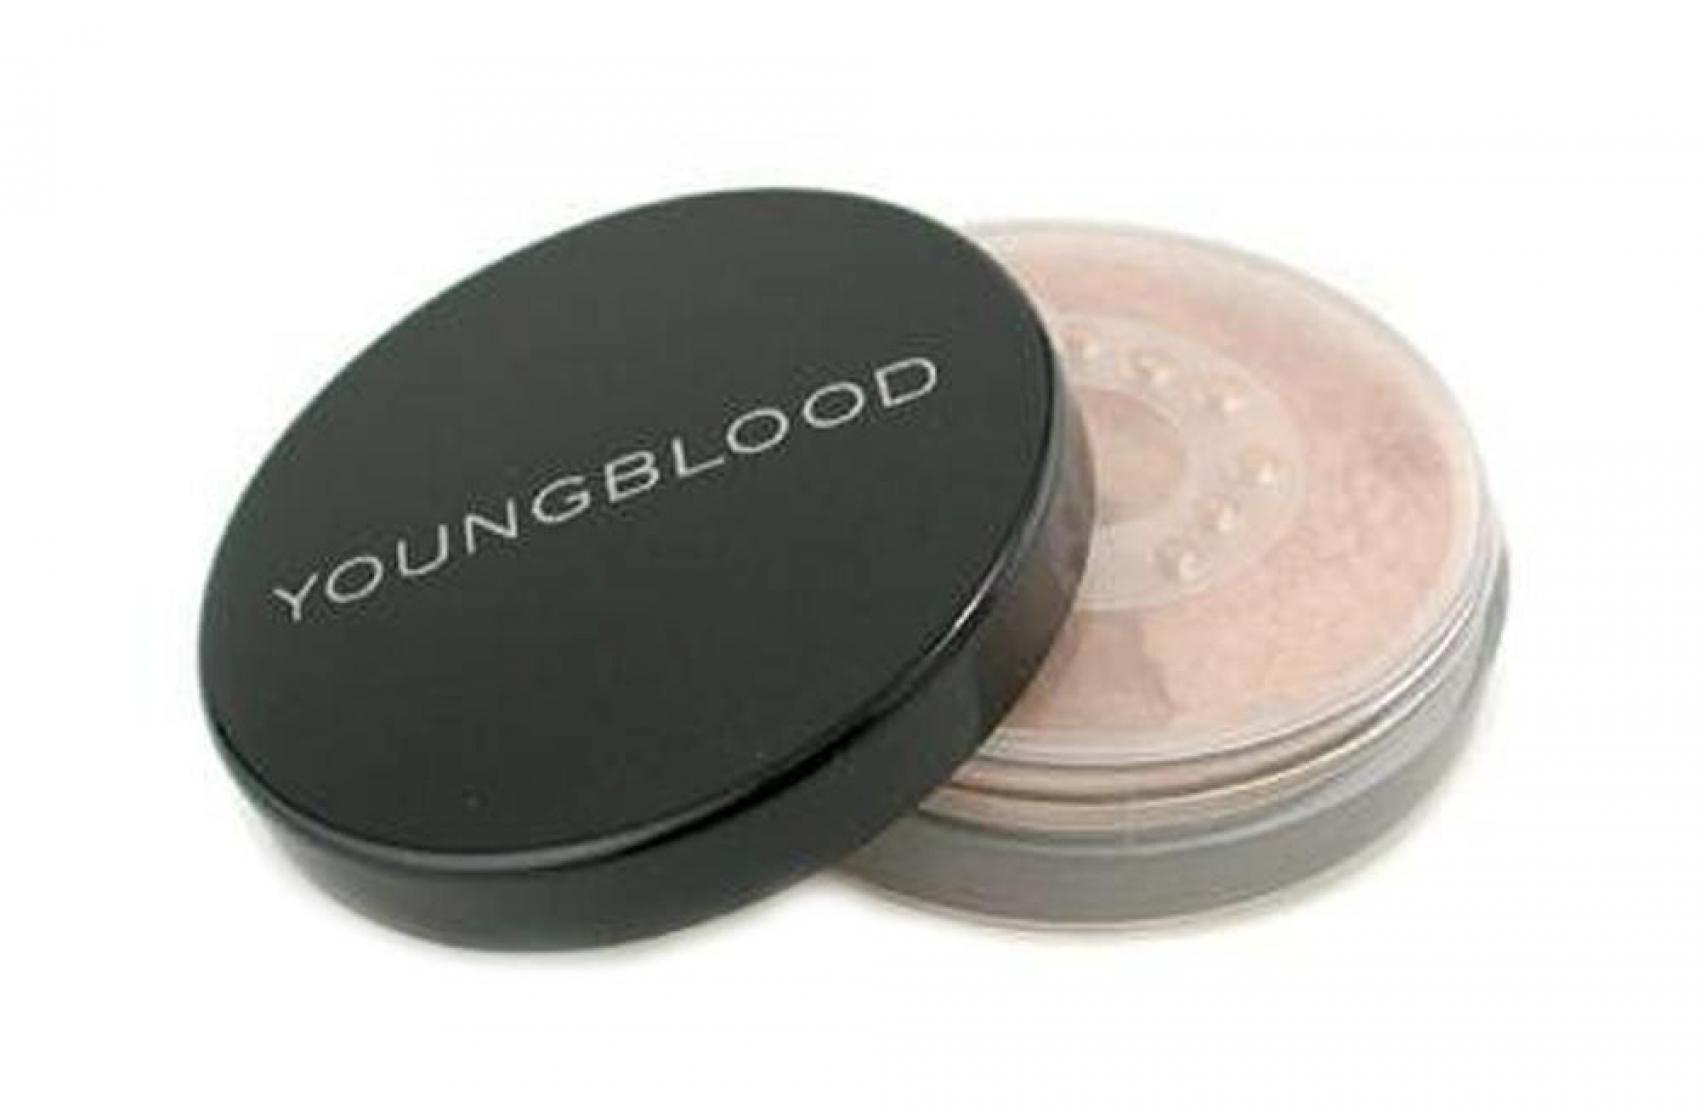 Youngblood-toz-fondoten nedir?